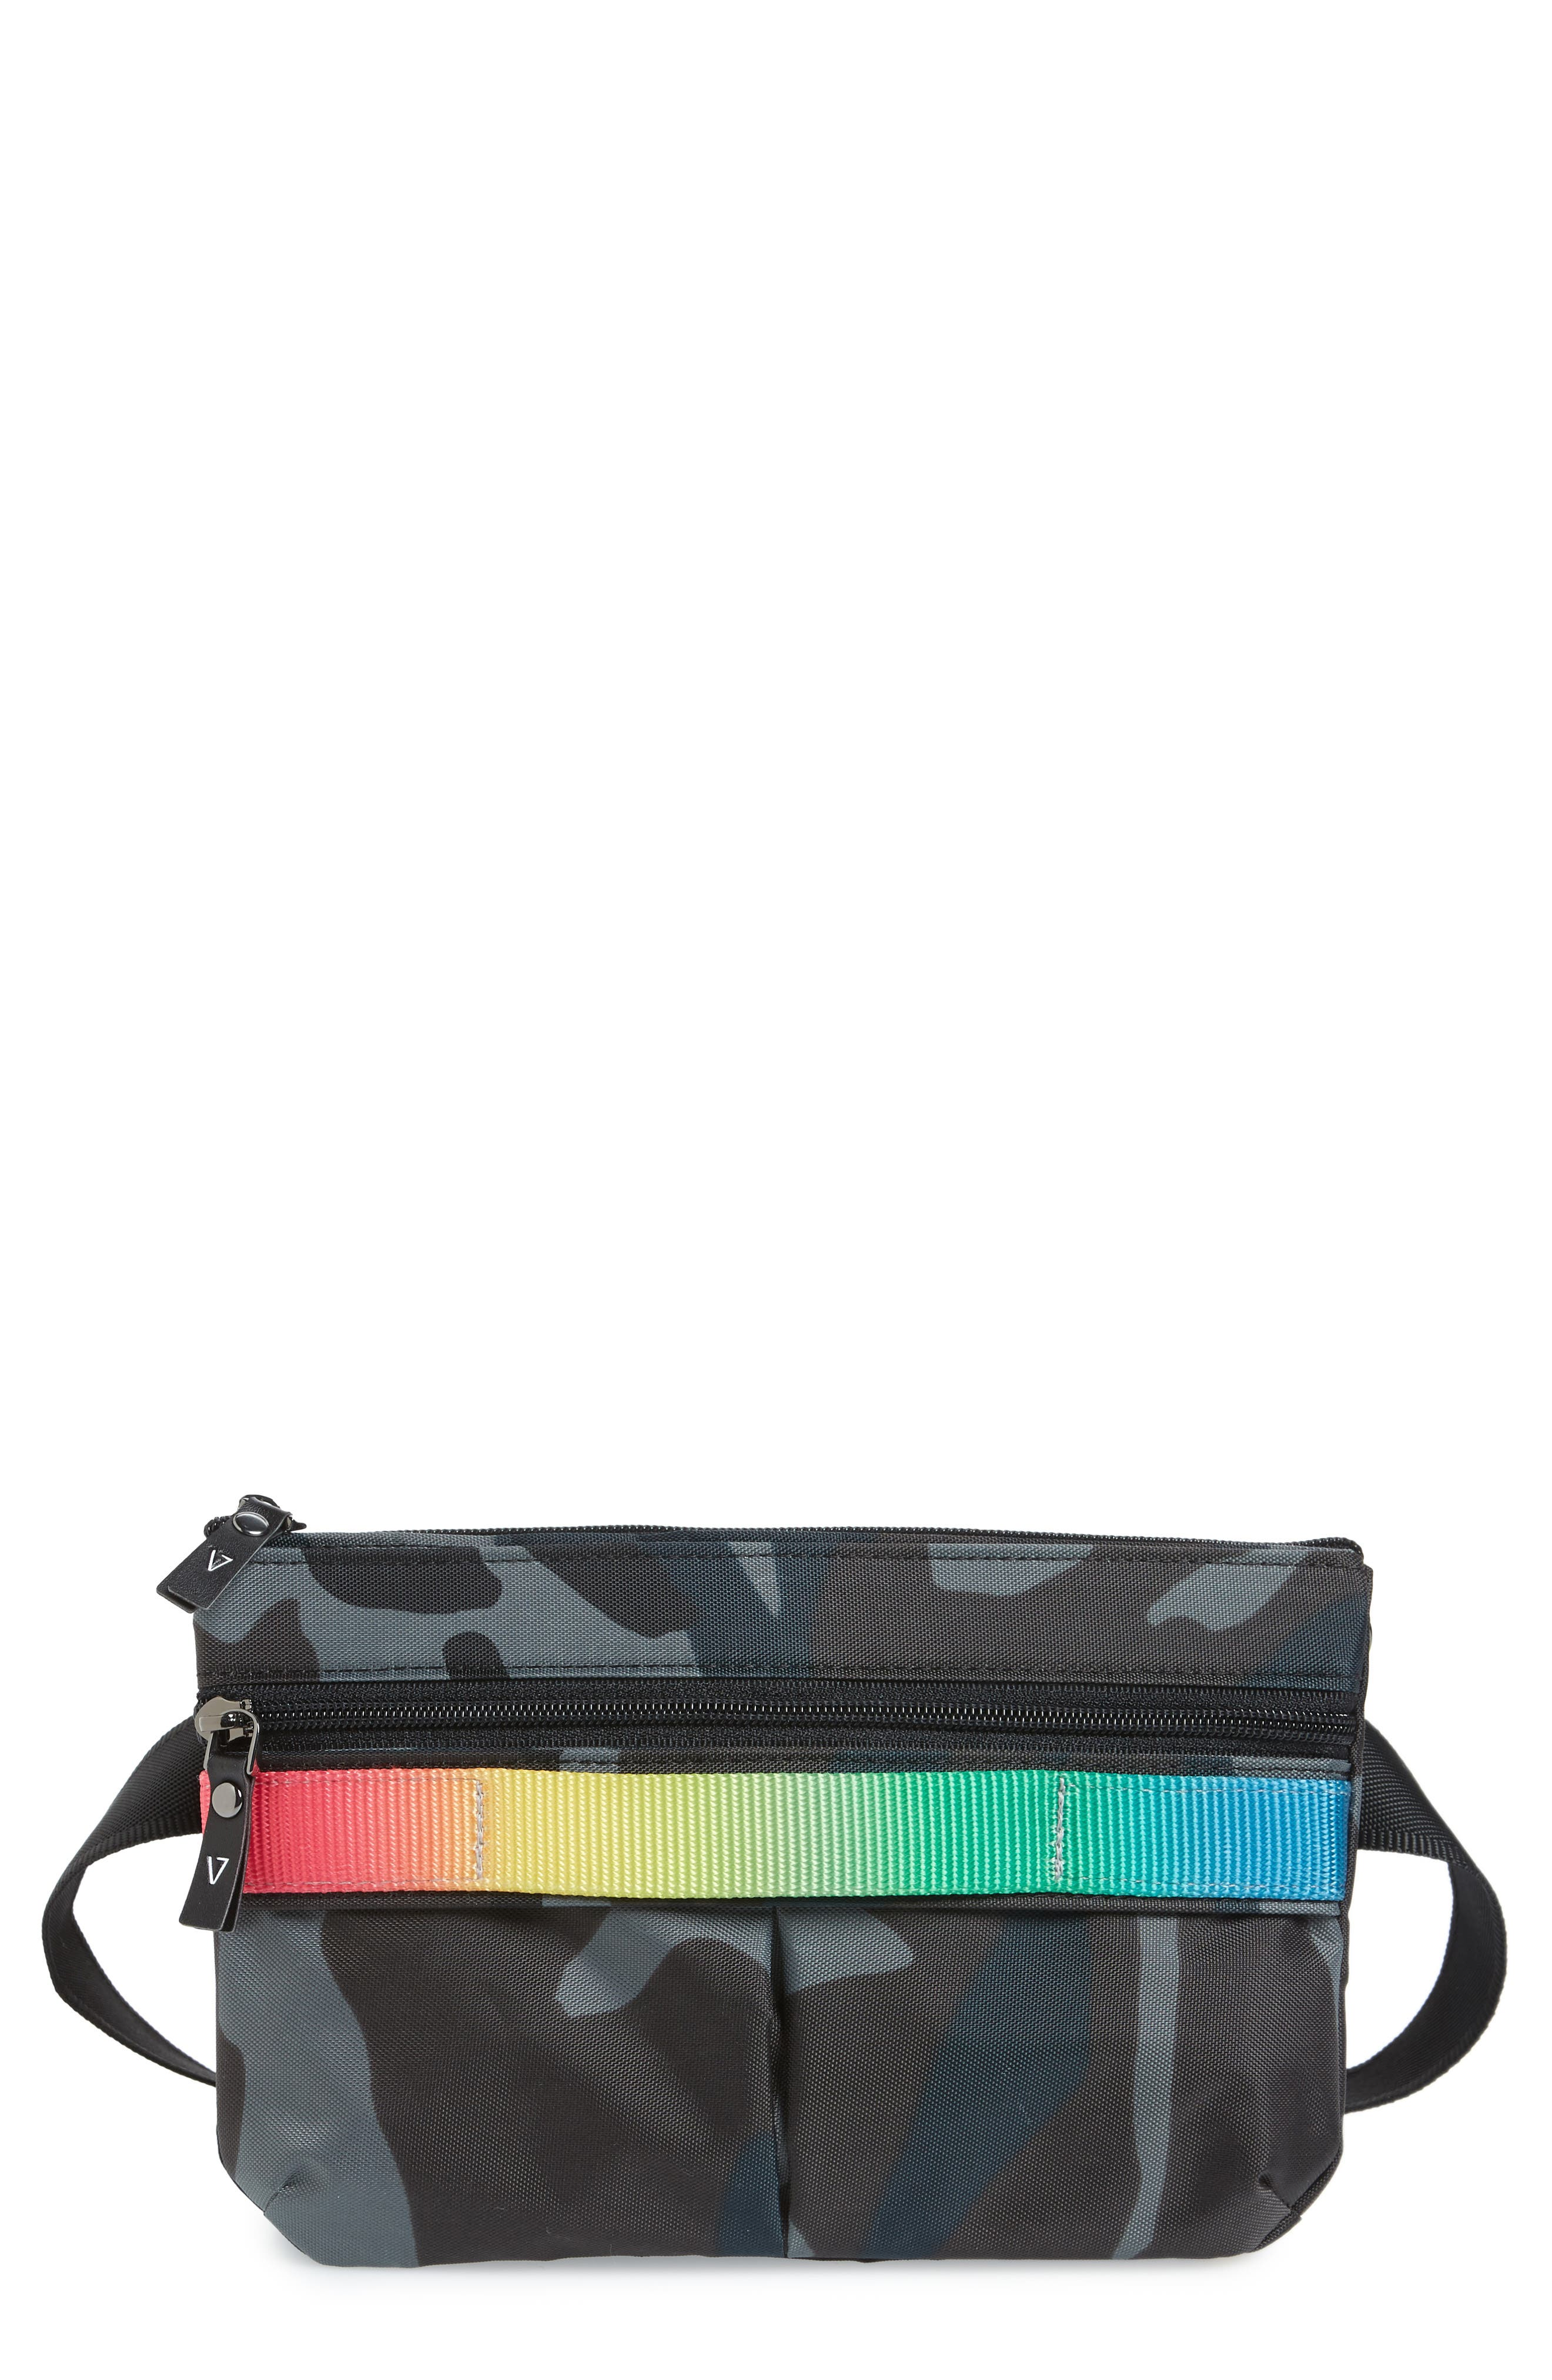 ANDI Go Camo Convertible Belt Bag - Blue in Navy Camo/ Rainbow